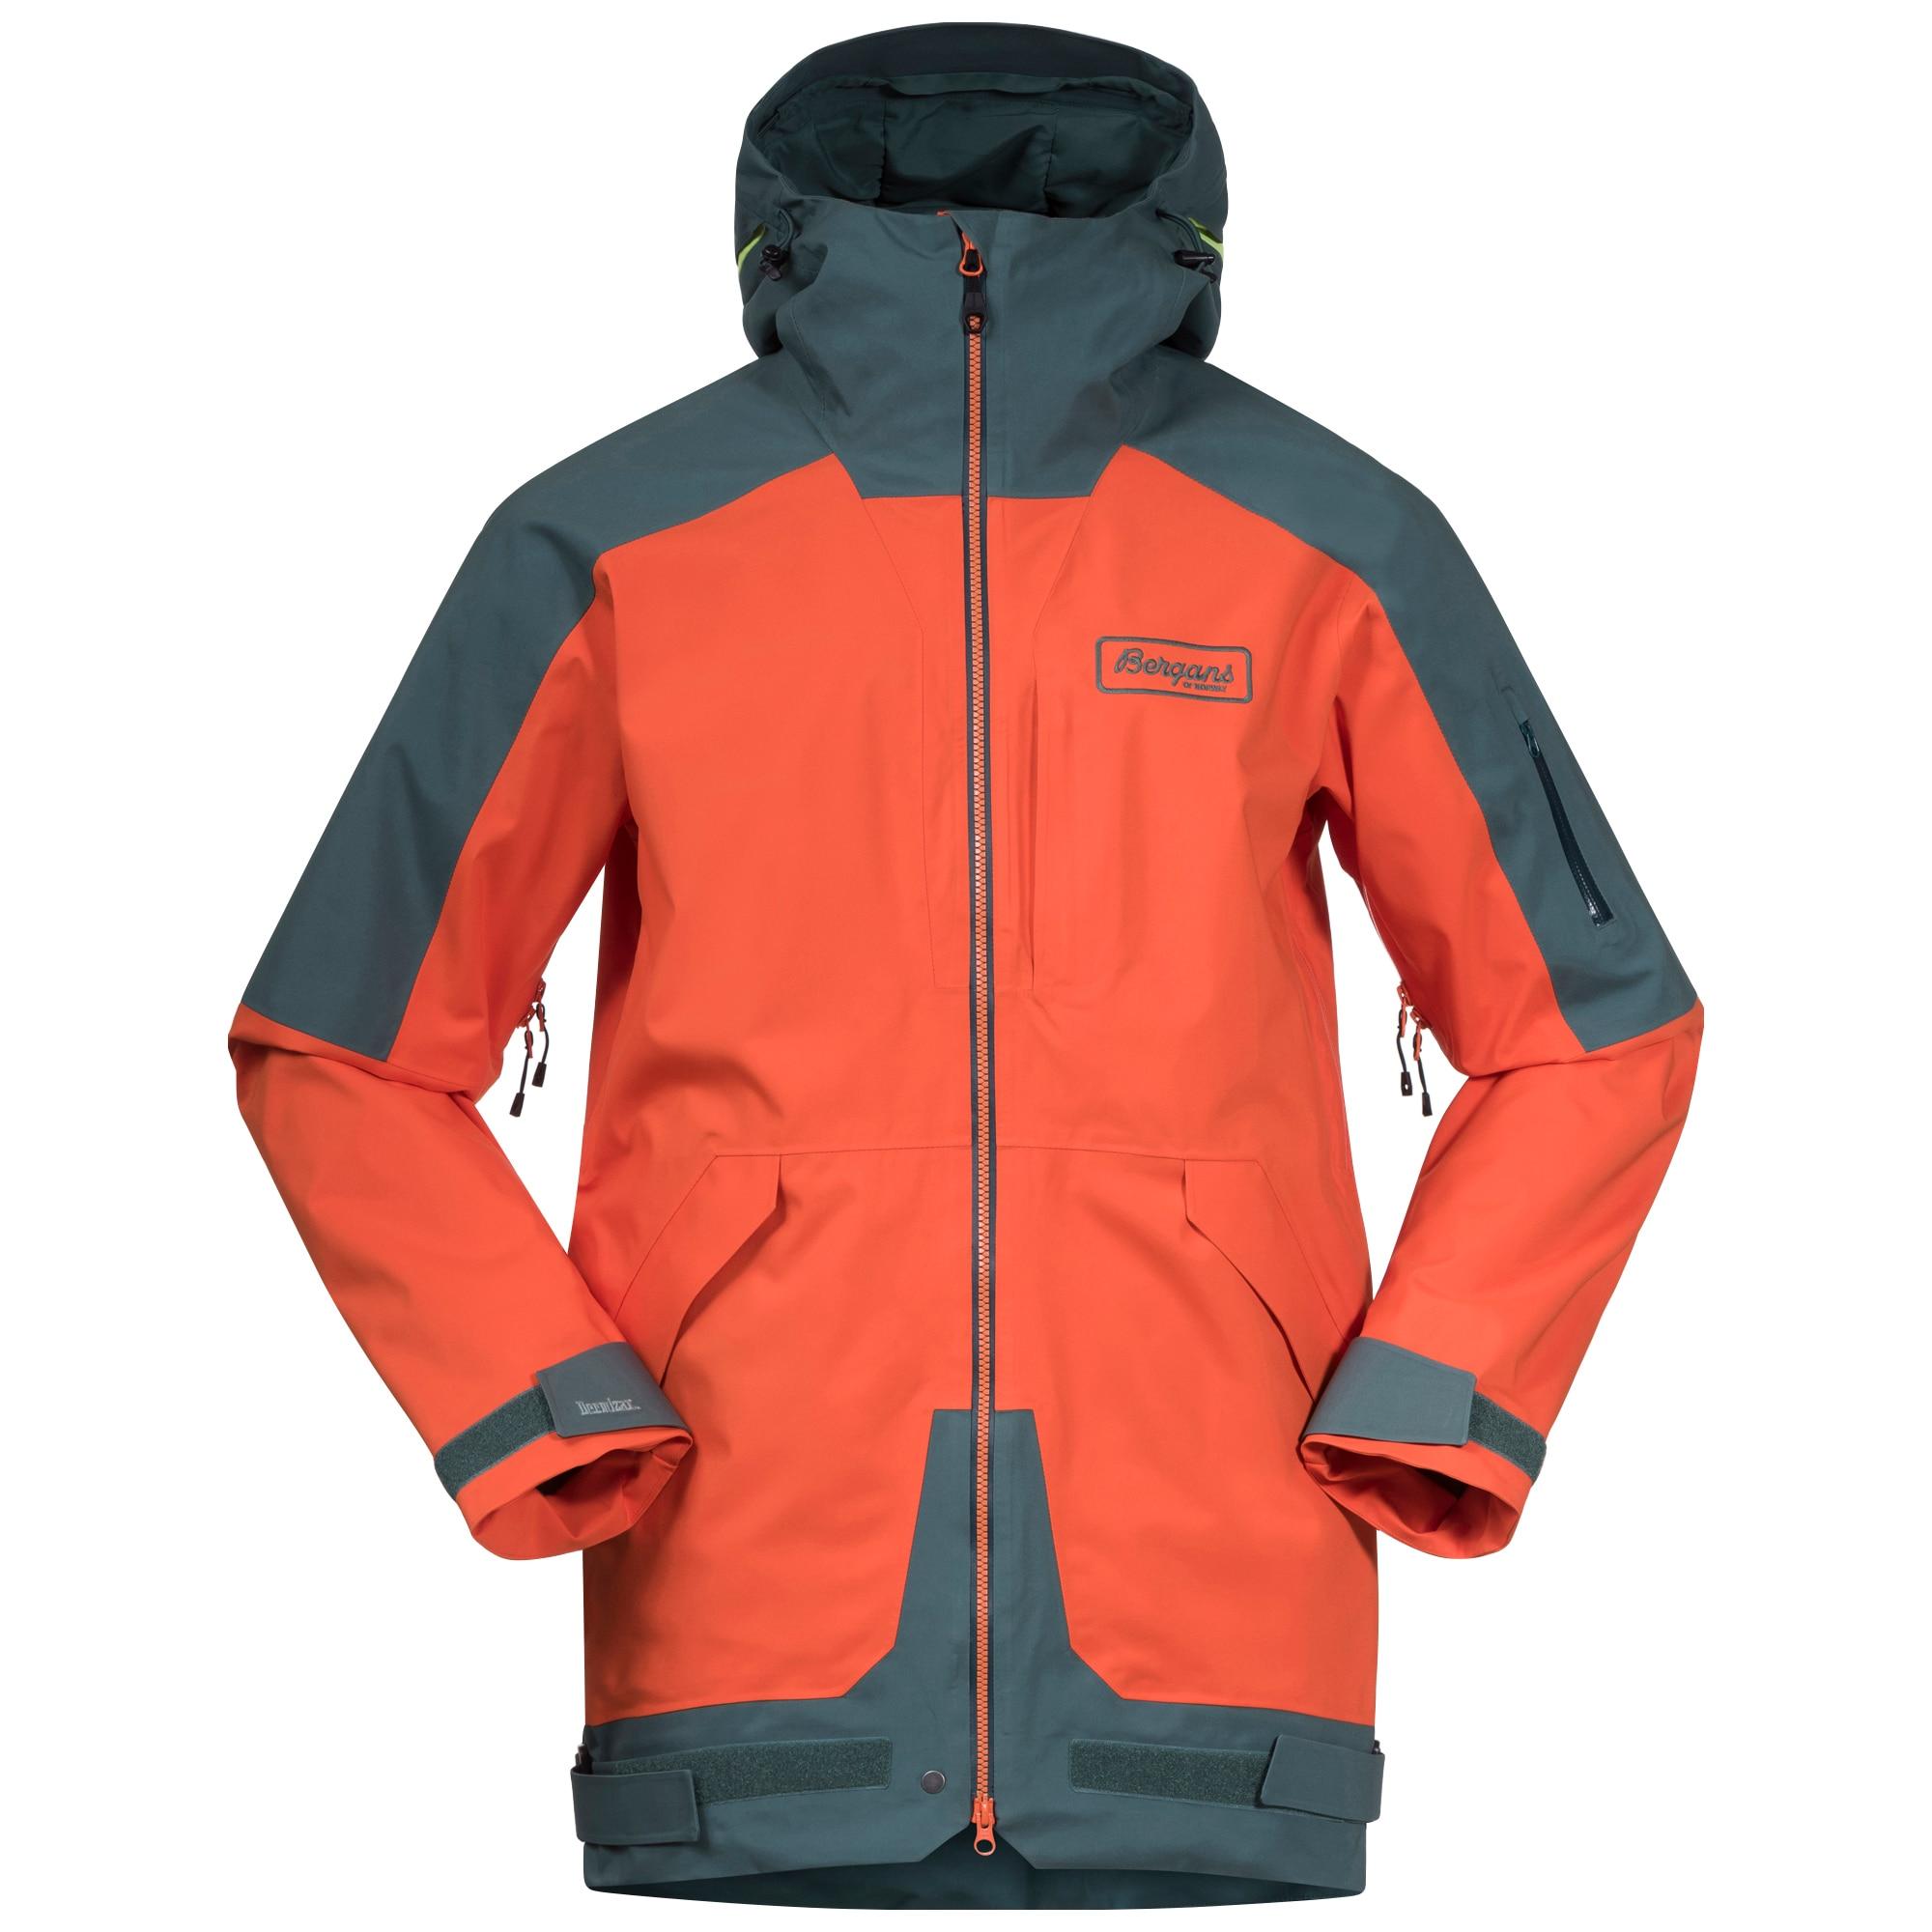 Myrkdalen V2 Insulated Jacket